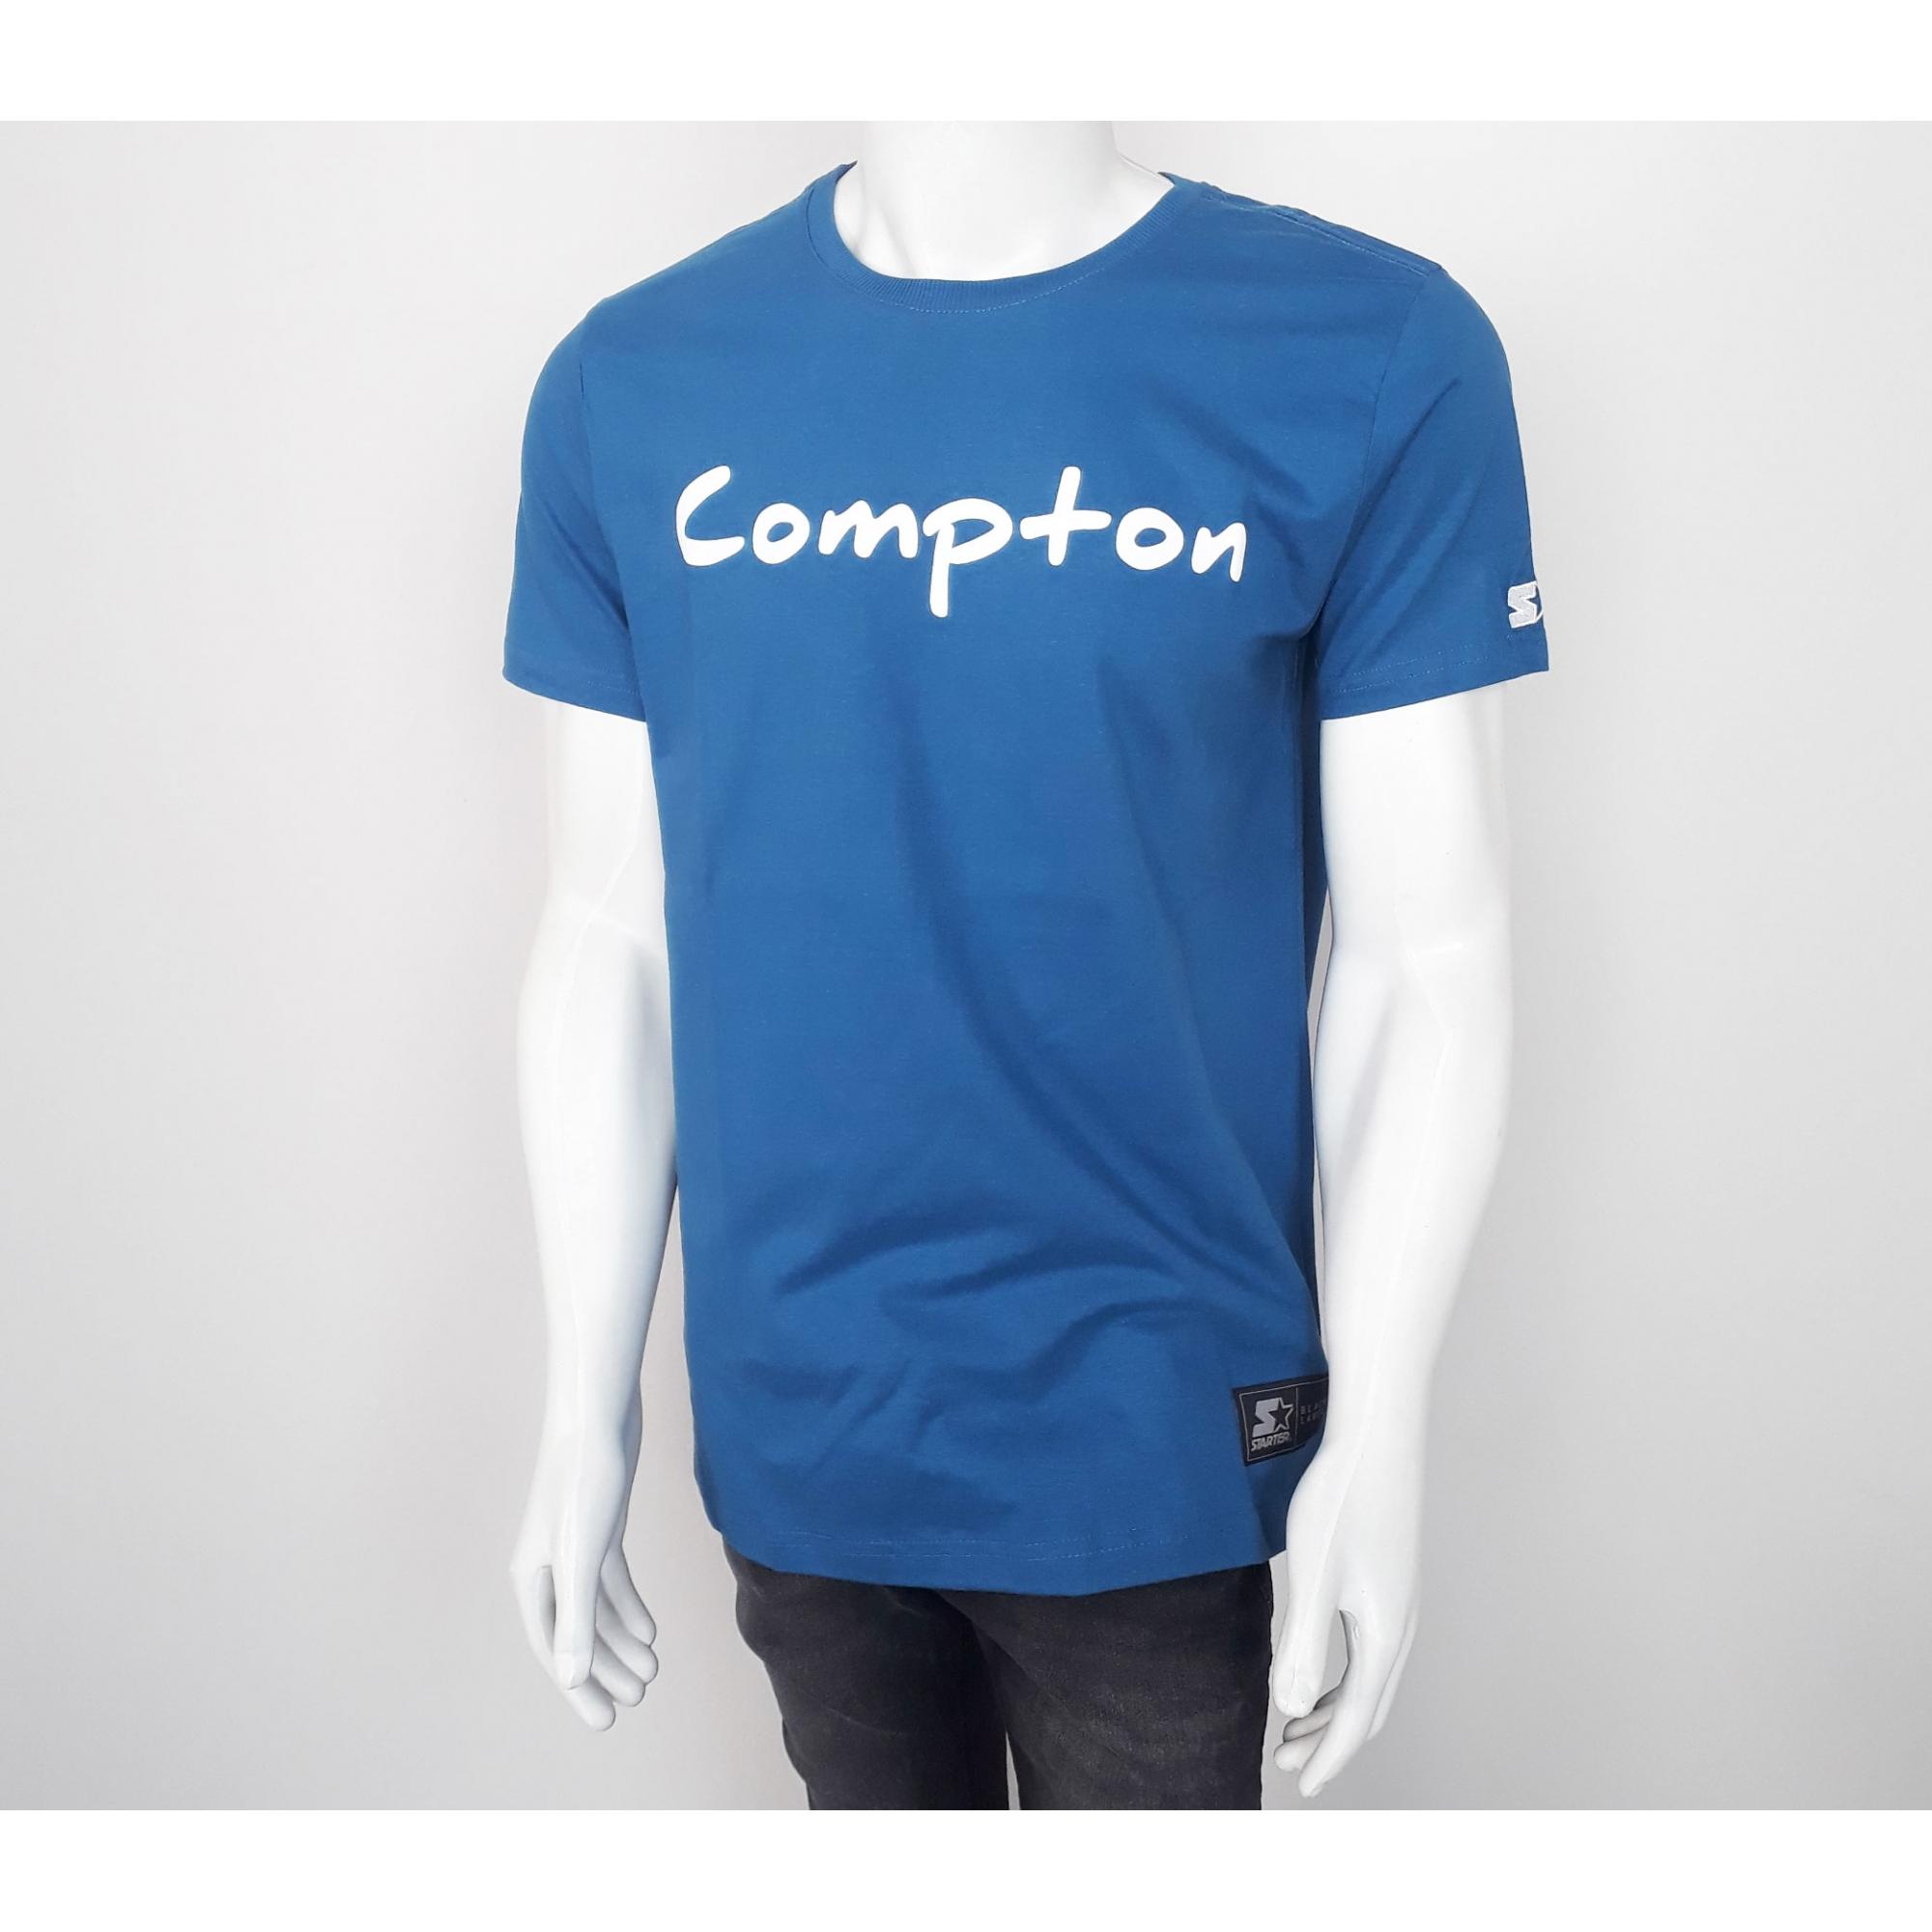 Camiseta Starter Compton Azul - P